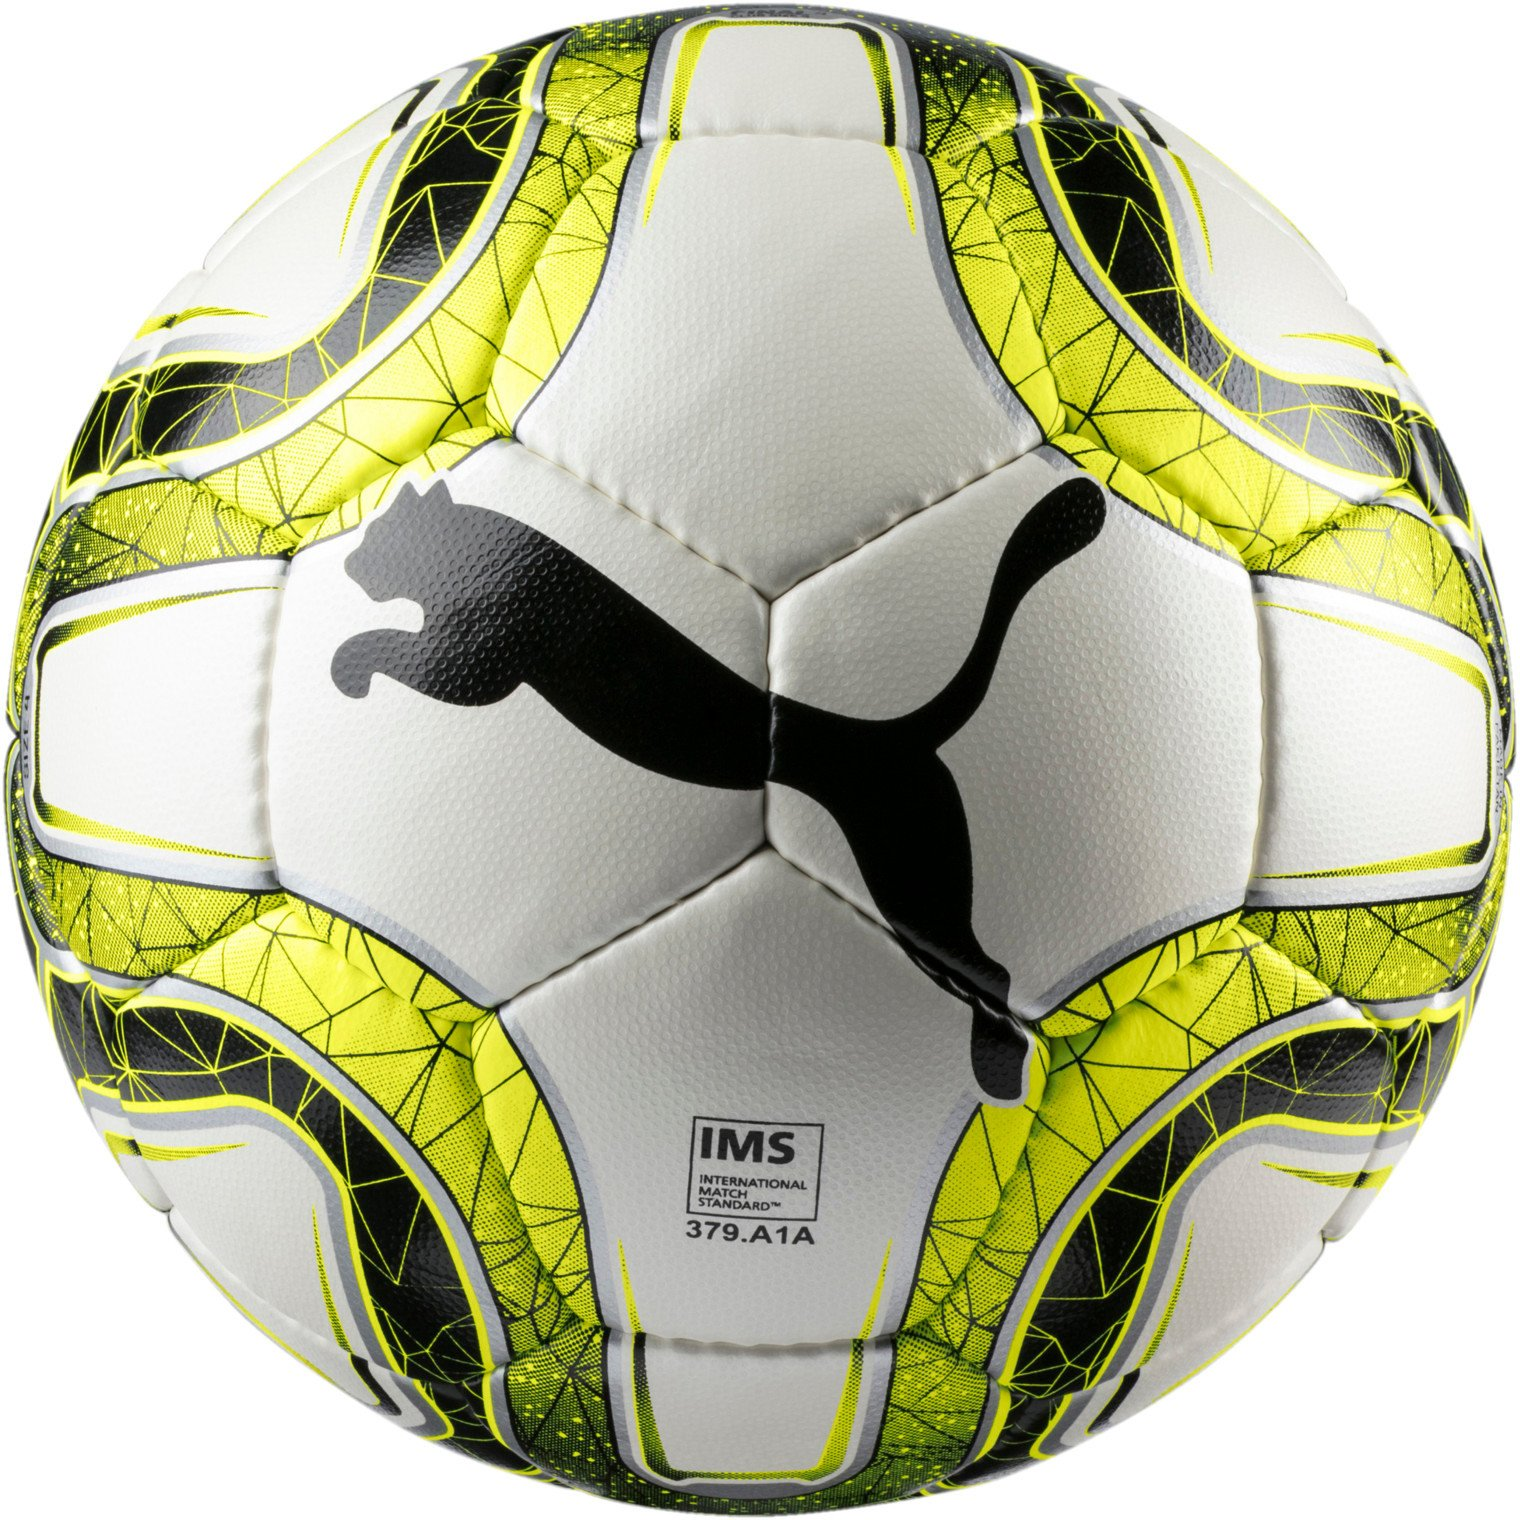 Balón Puma FINAL 4 Club (IMS Appr) sz 4